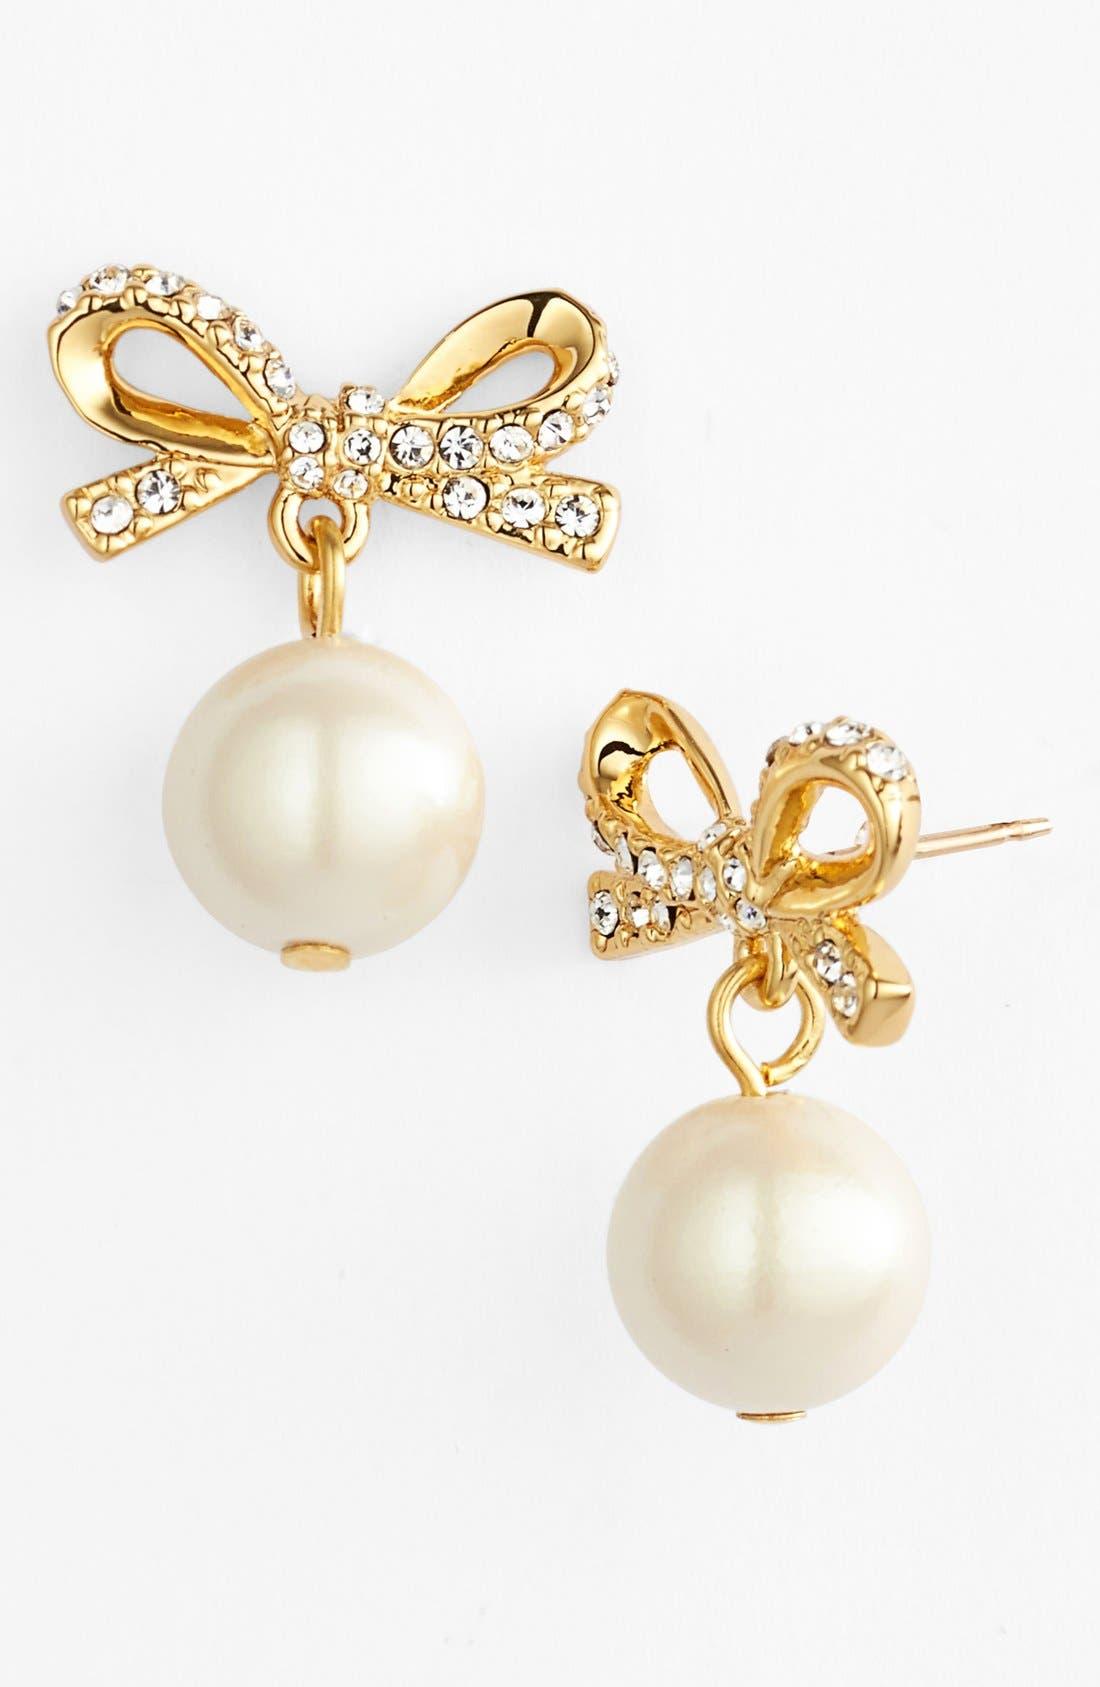 KATE SPADE NEW YORK,                             'skinny mini' bow drop earrings,                             Main thumbnail 1, color,                             142